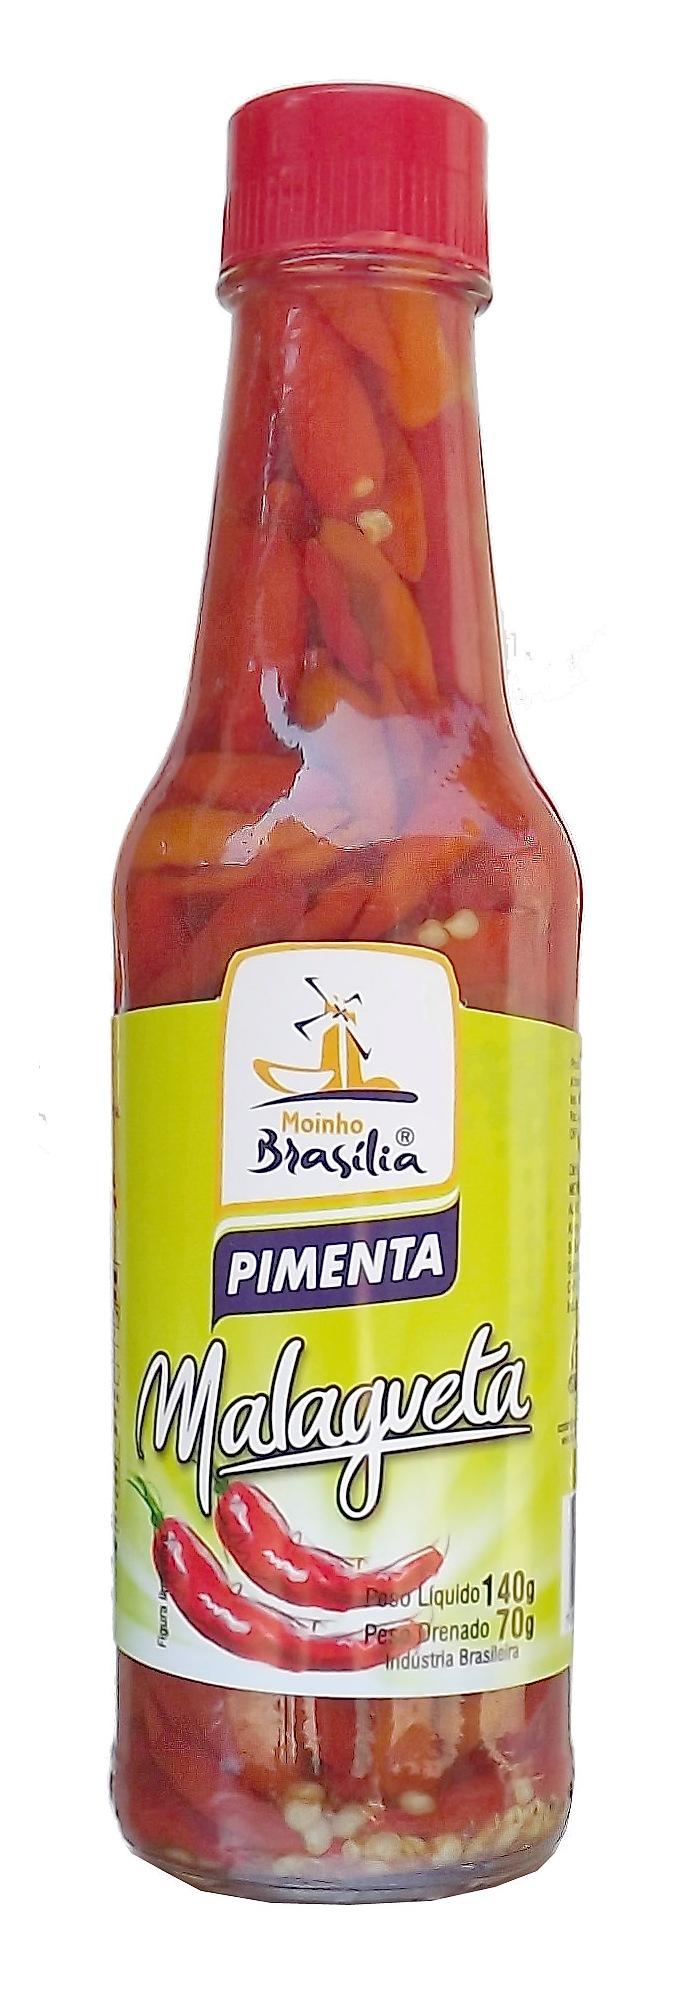 Cod.451-Pimenta malagueta vermelha 70g